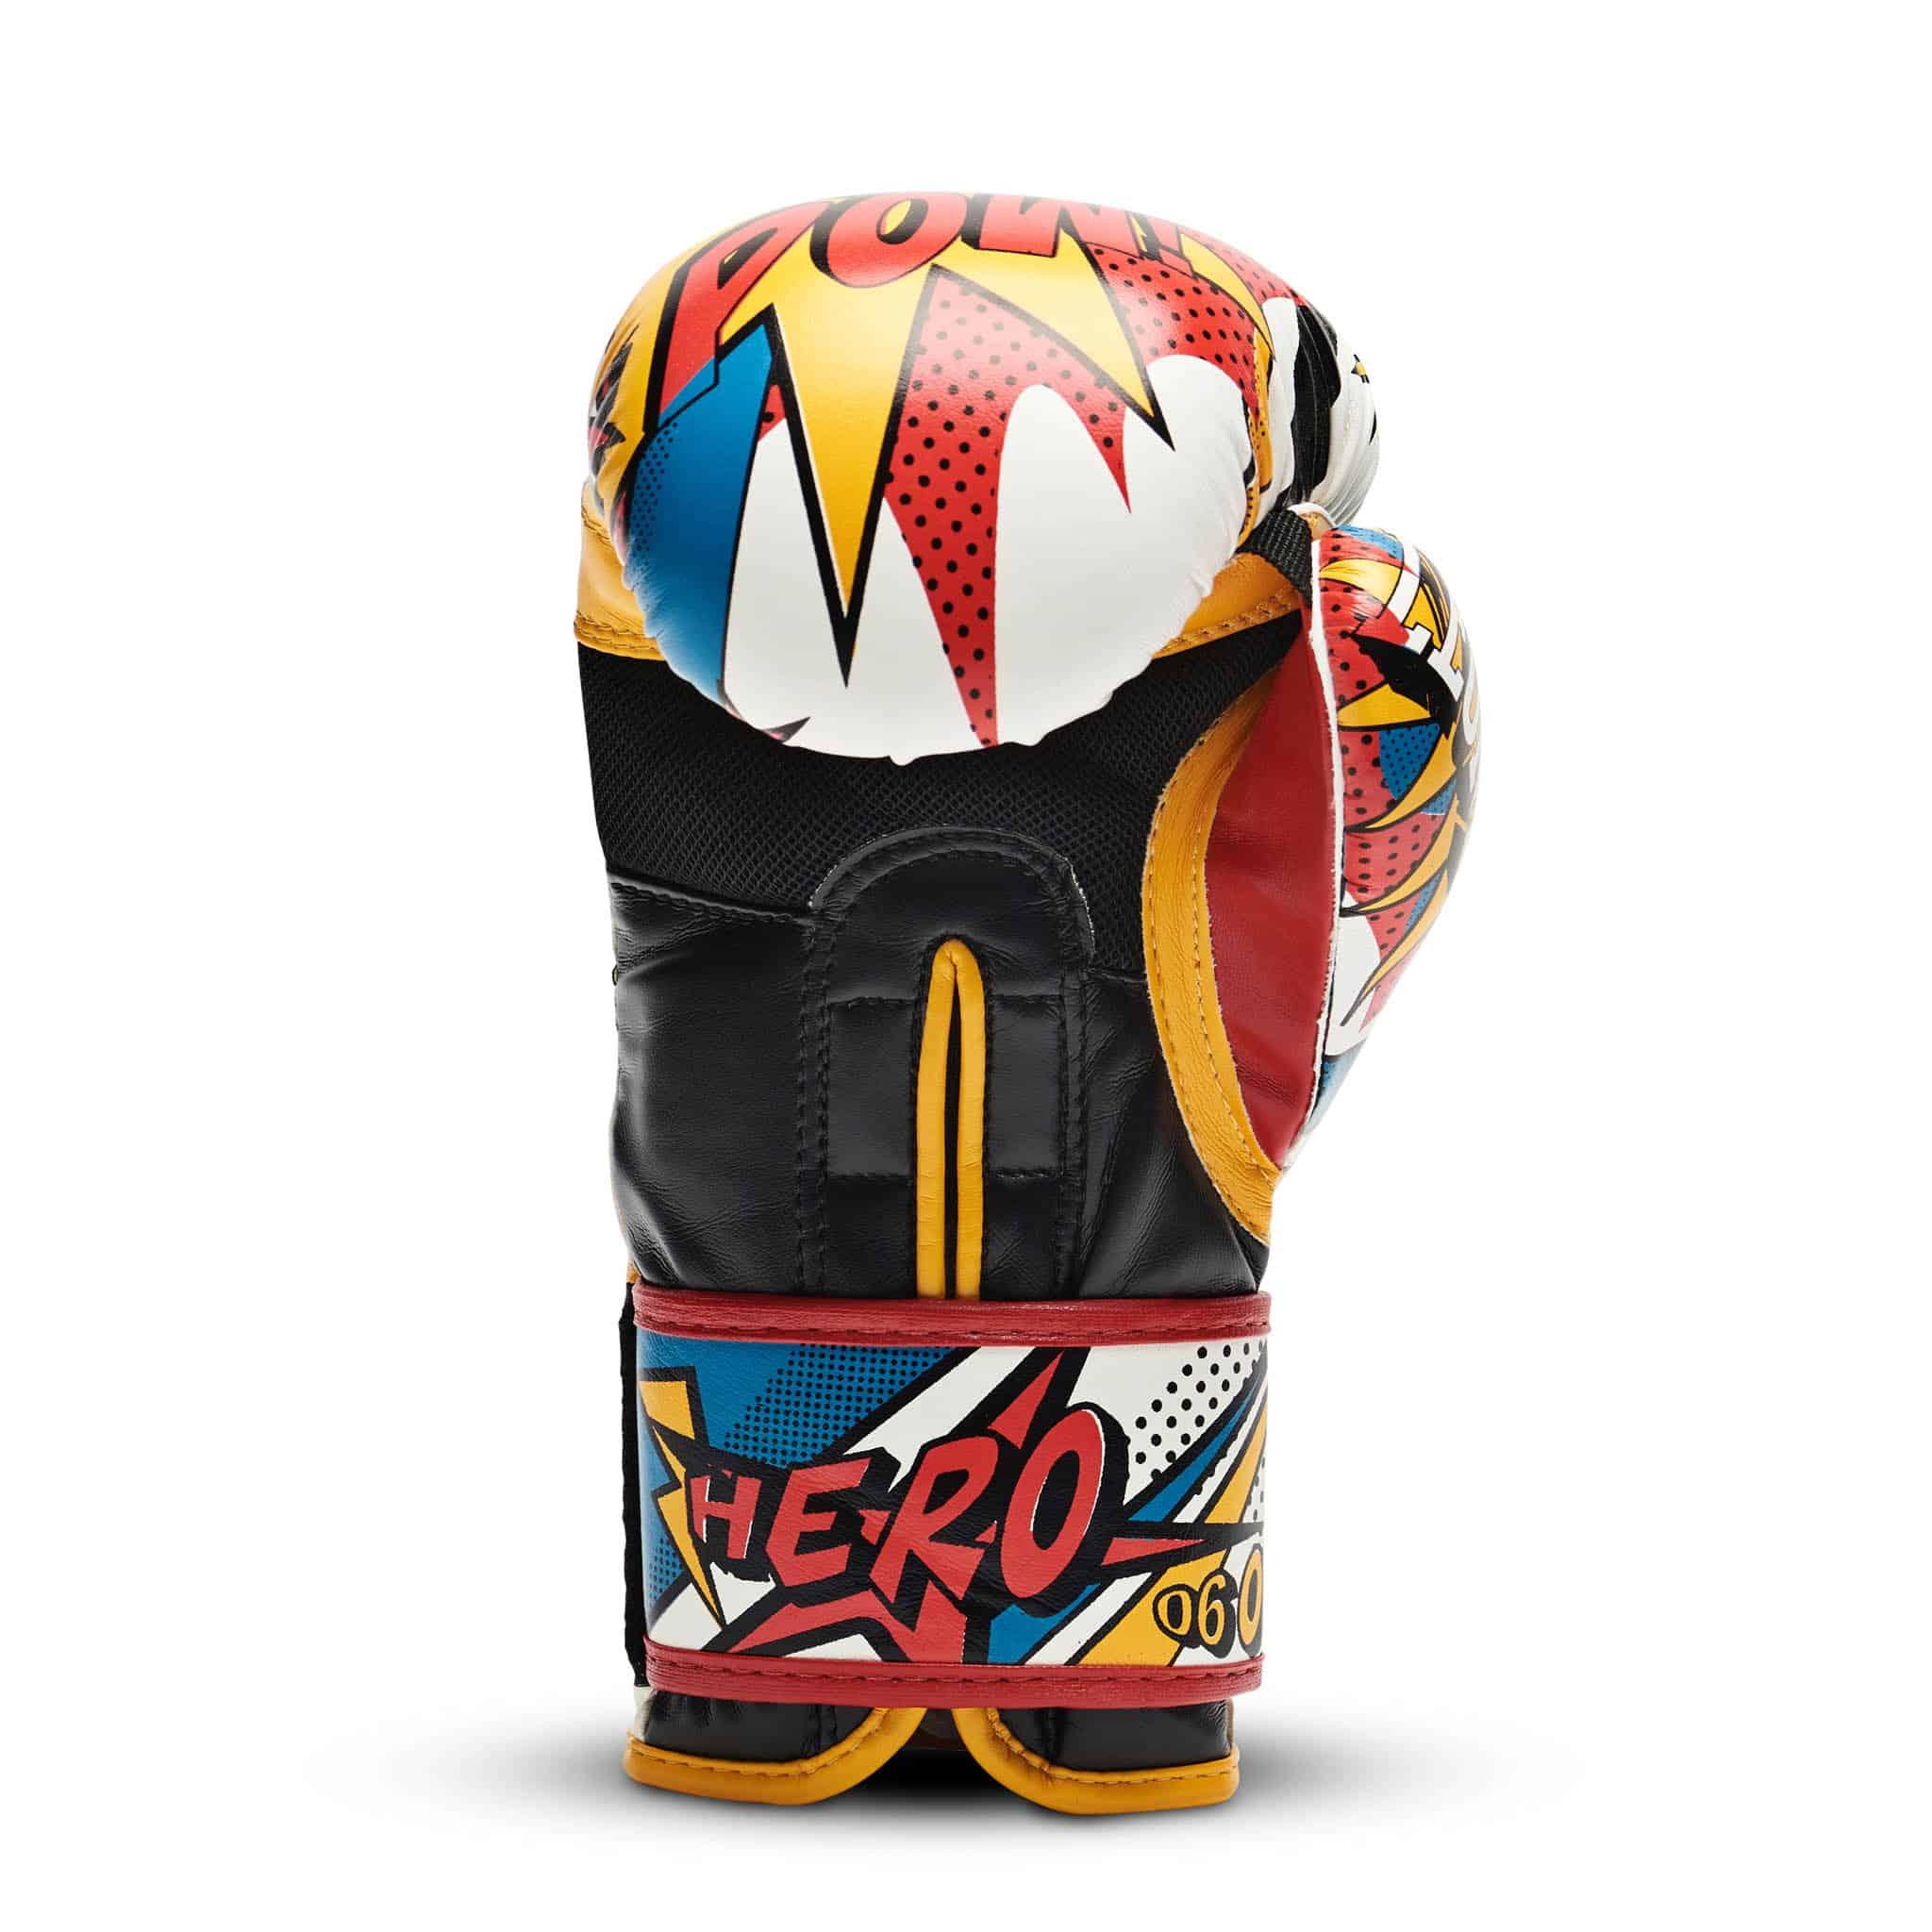 guantes de box niño